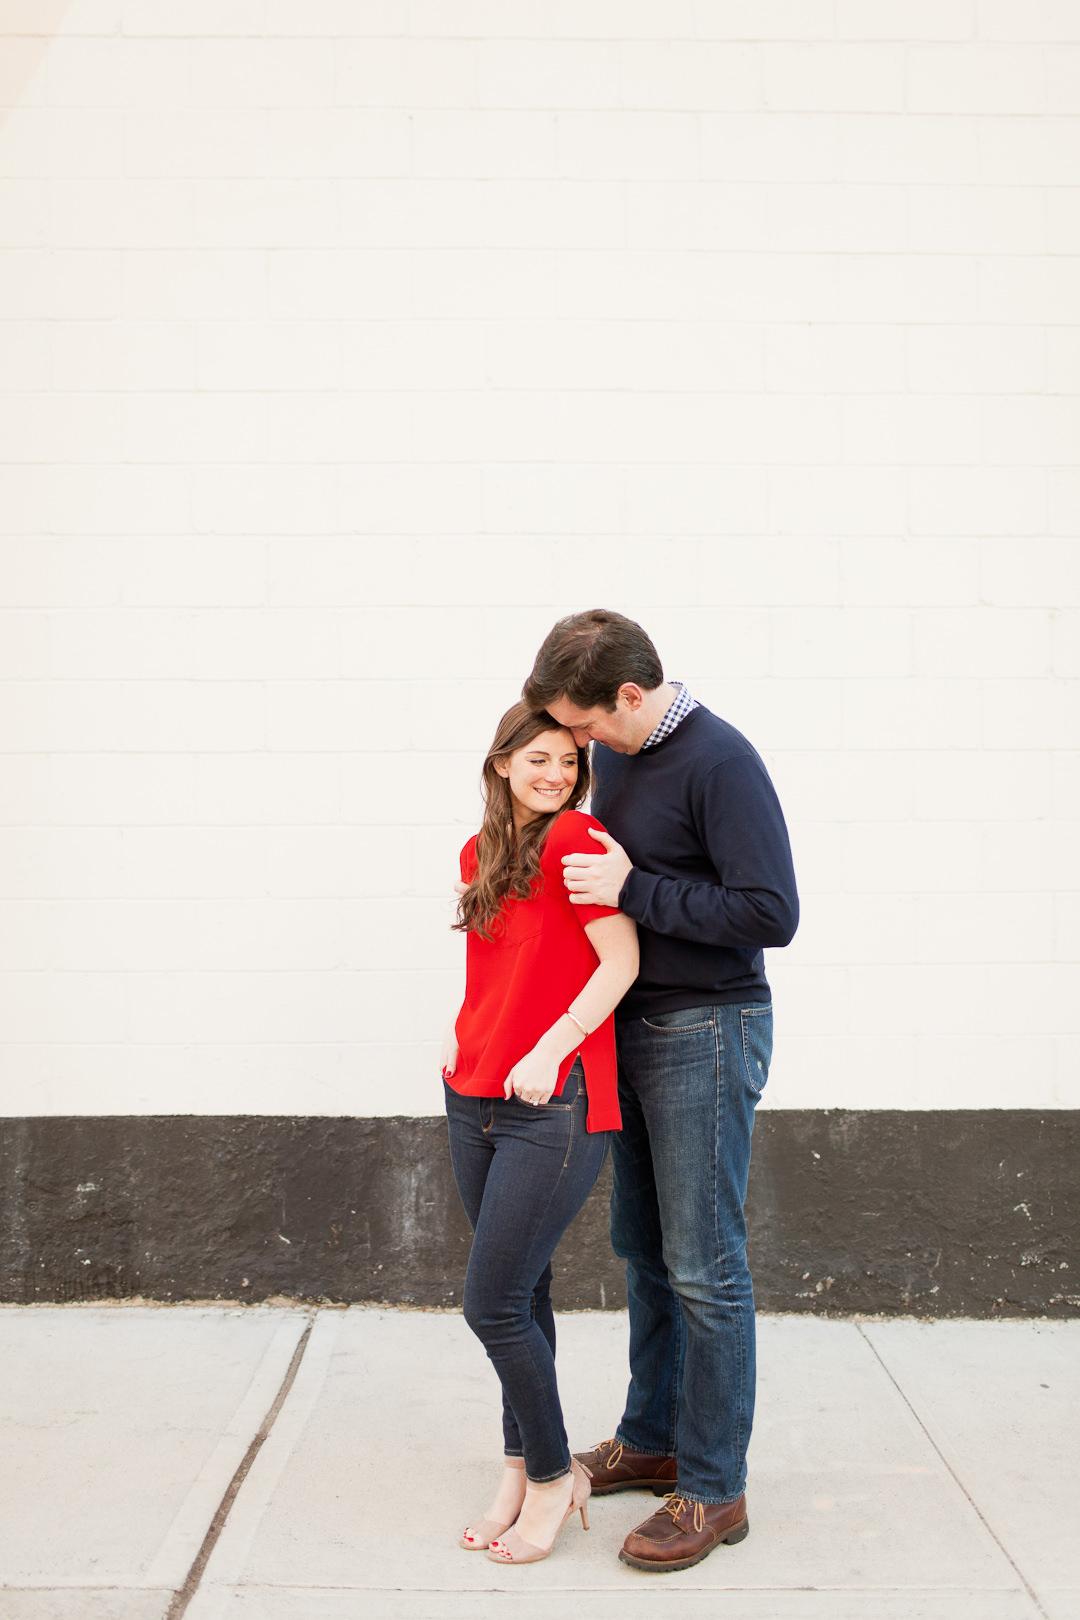 Melissa Kruse Photography - Tess & Brendan Engagement Photos-48.jpg